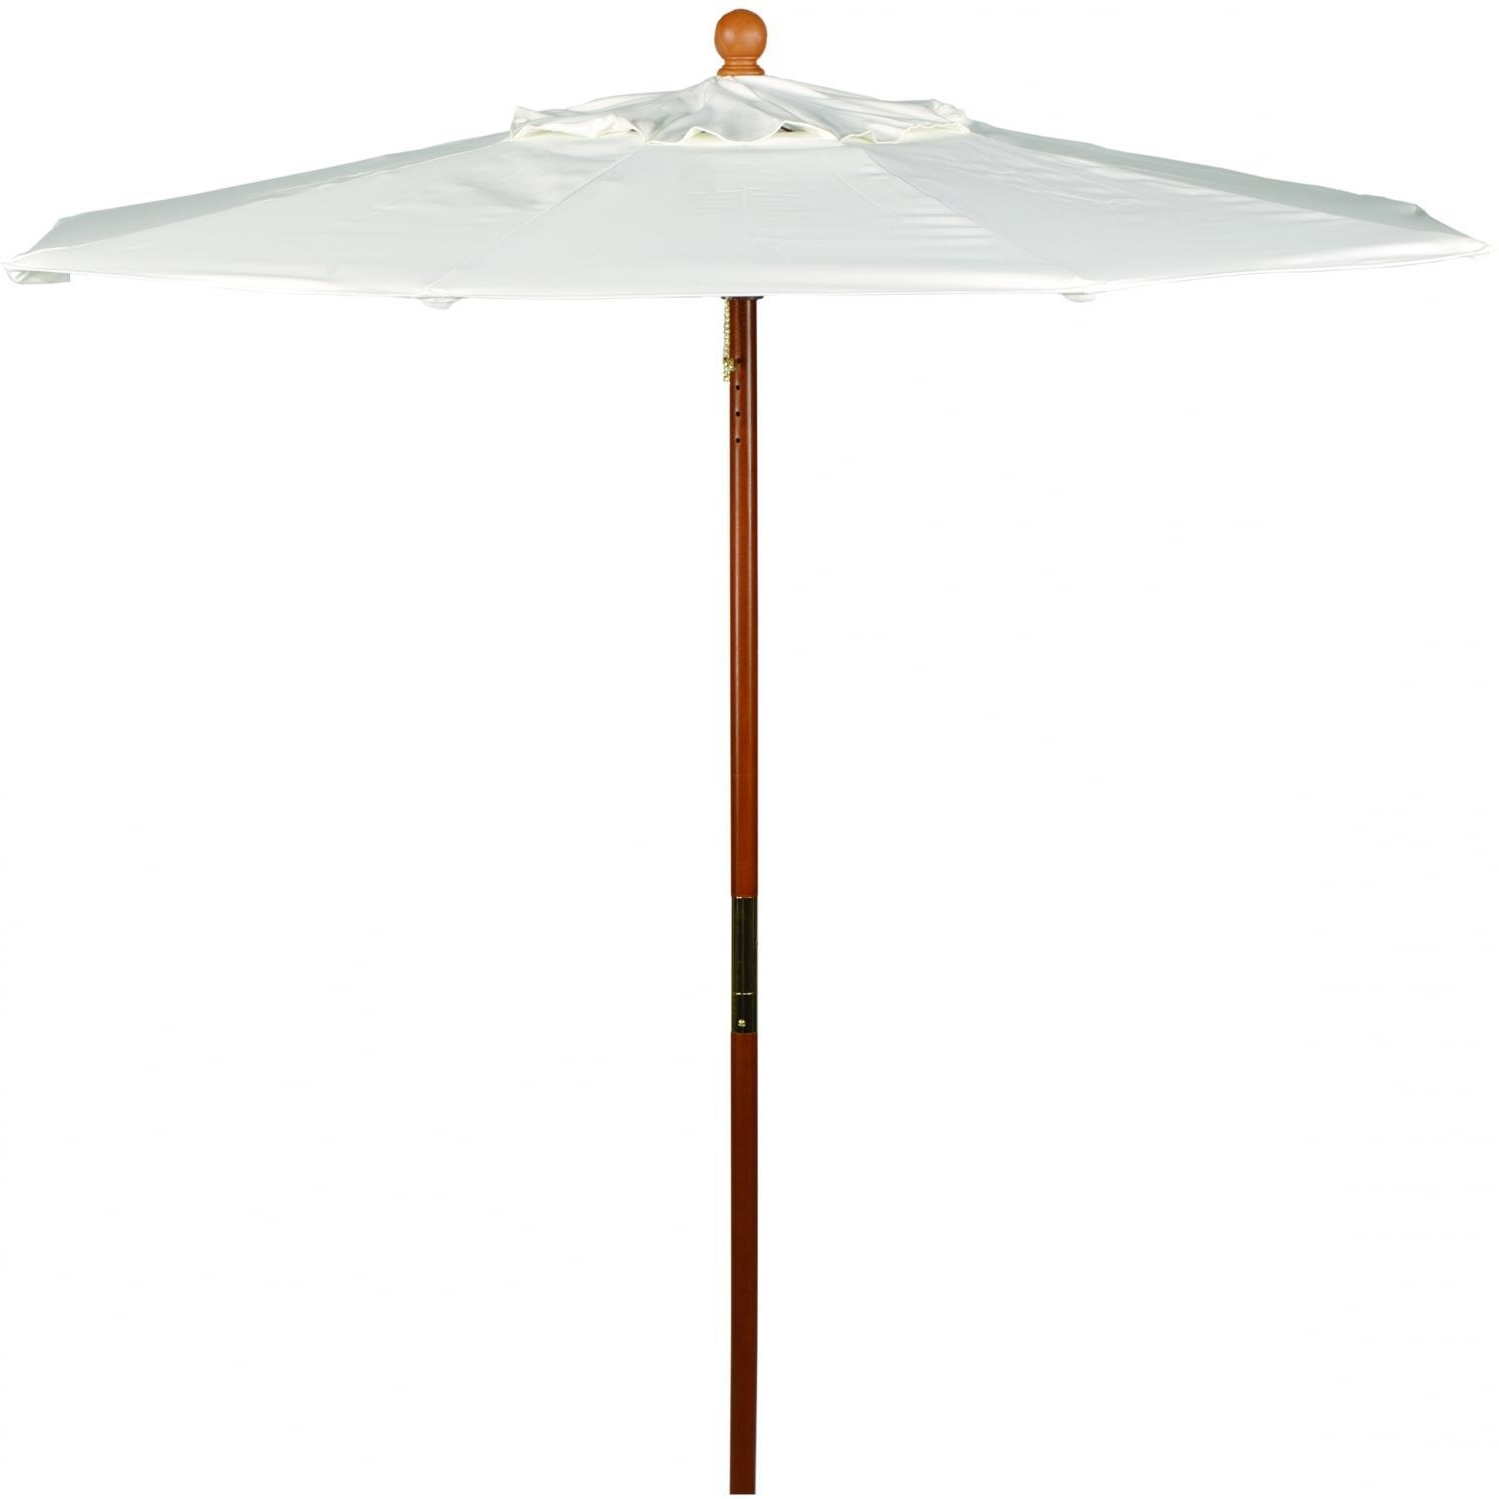 Favorite Jewel Patio Umbrellas Regarding 49 6 Foot Patio Umbrellas, 6#039; Patio Umbrellas Market Umbrellas (View 5 of 20)